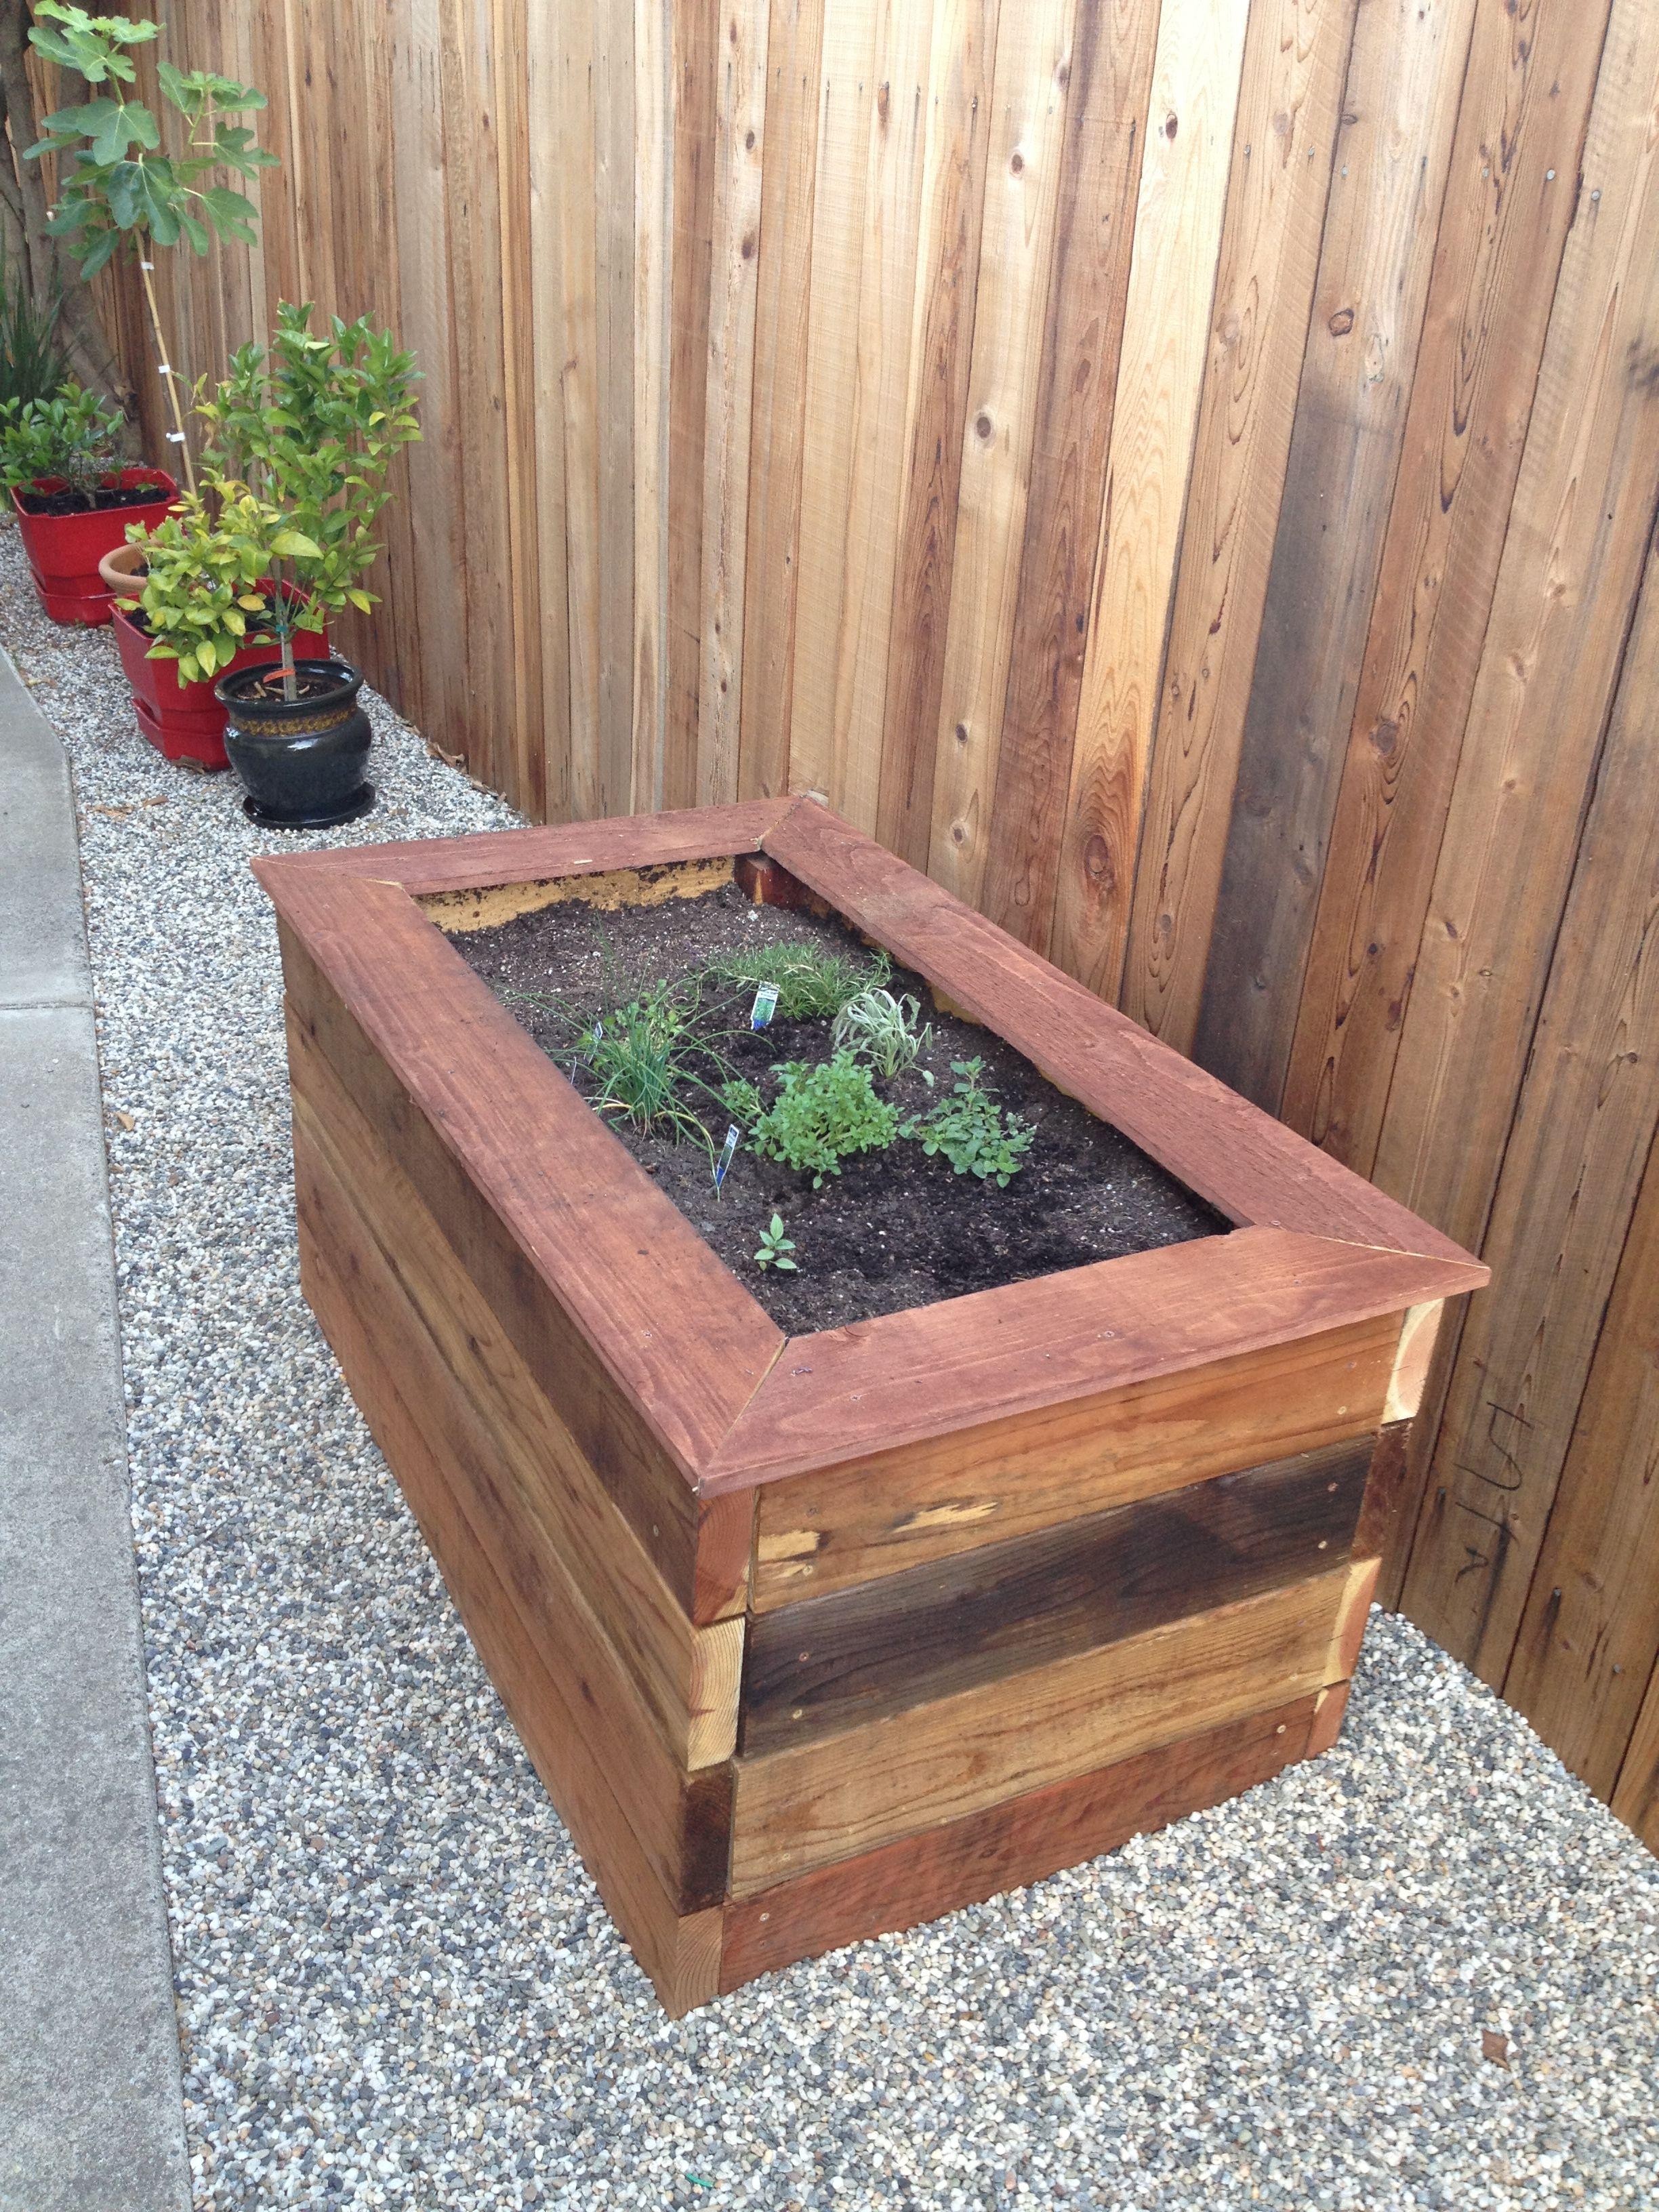 Elegant Redwood Planter Box With Images Redwood Planter Boxes Redwood Planter Raised Planter Boxes